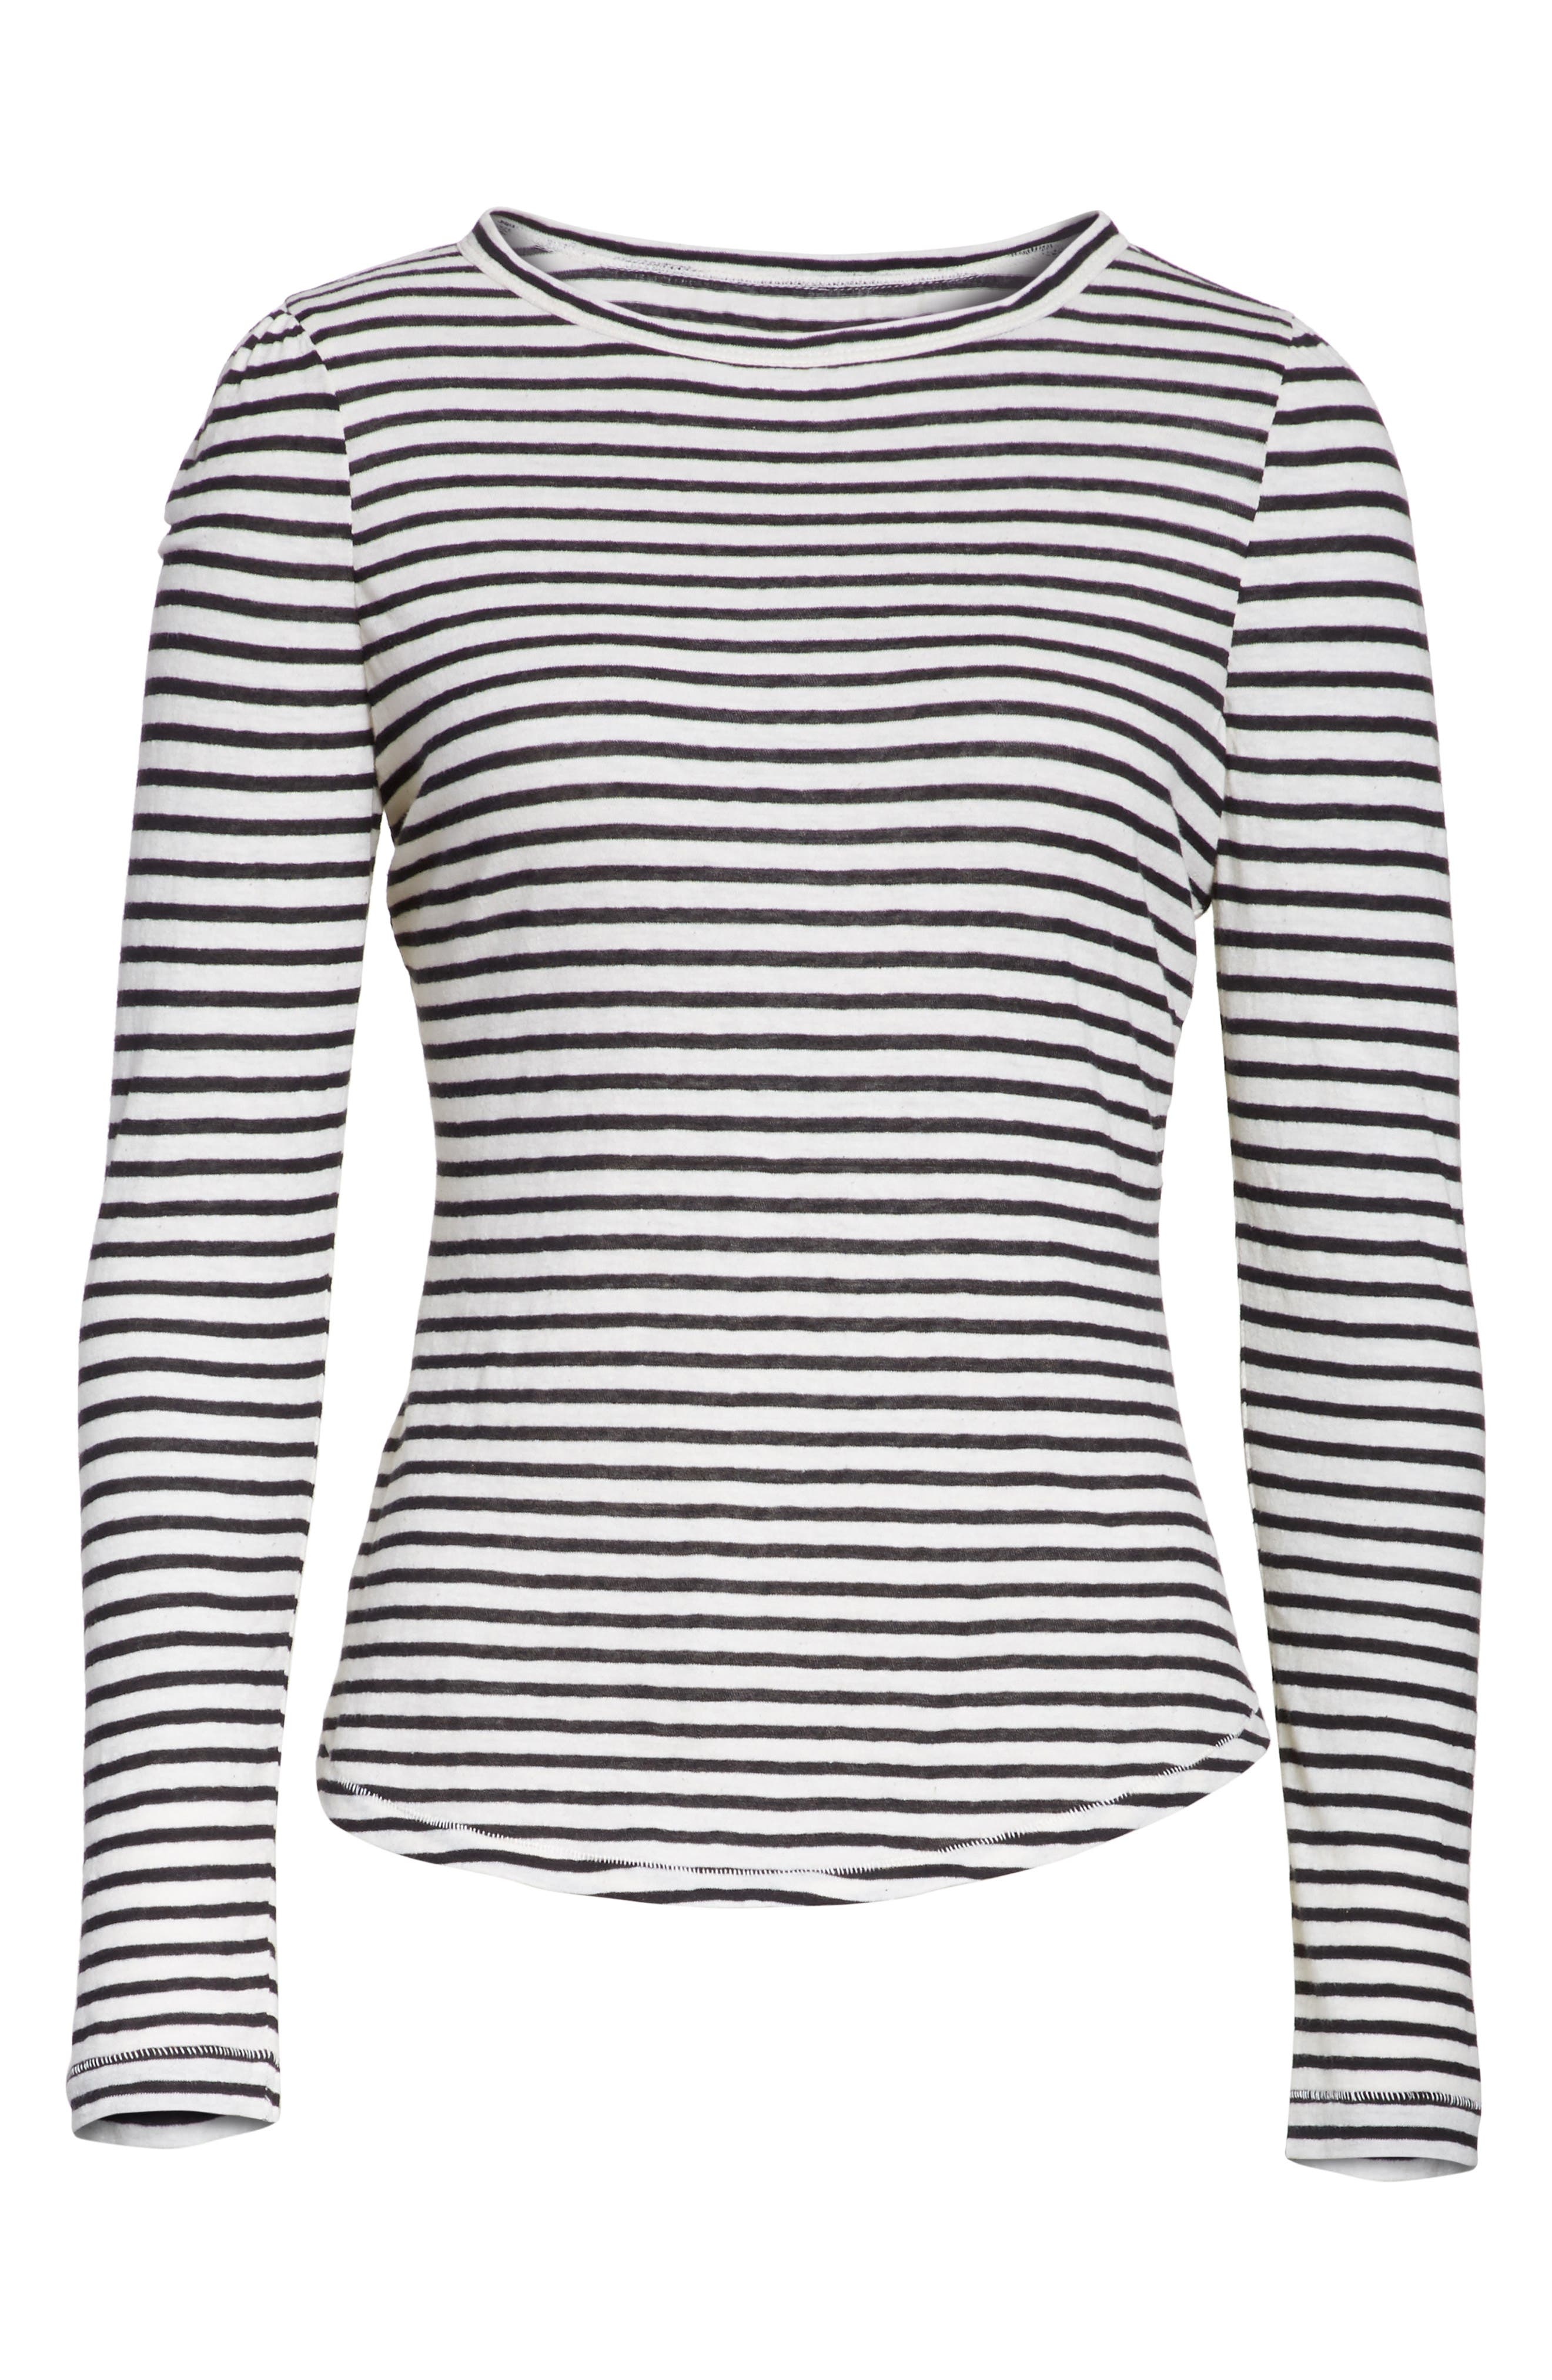 Long Sleeve Stripe Tee,                             Alternate thumbnail 6, color,                             Chalk/ Black